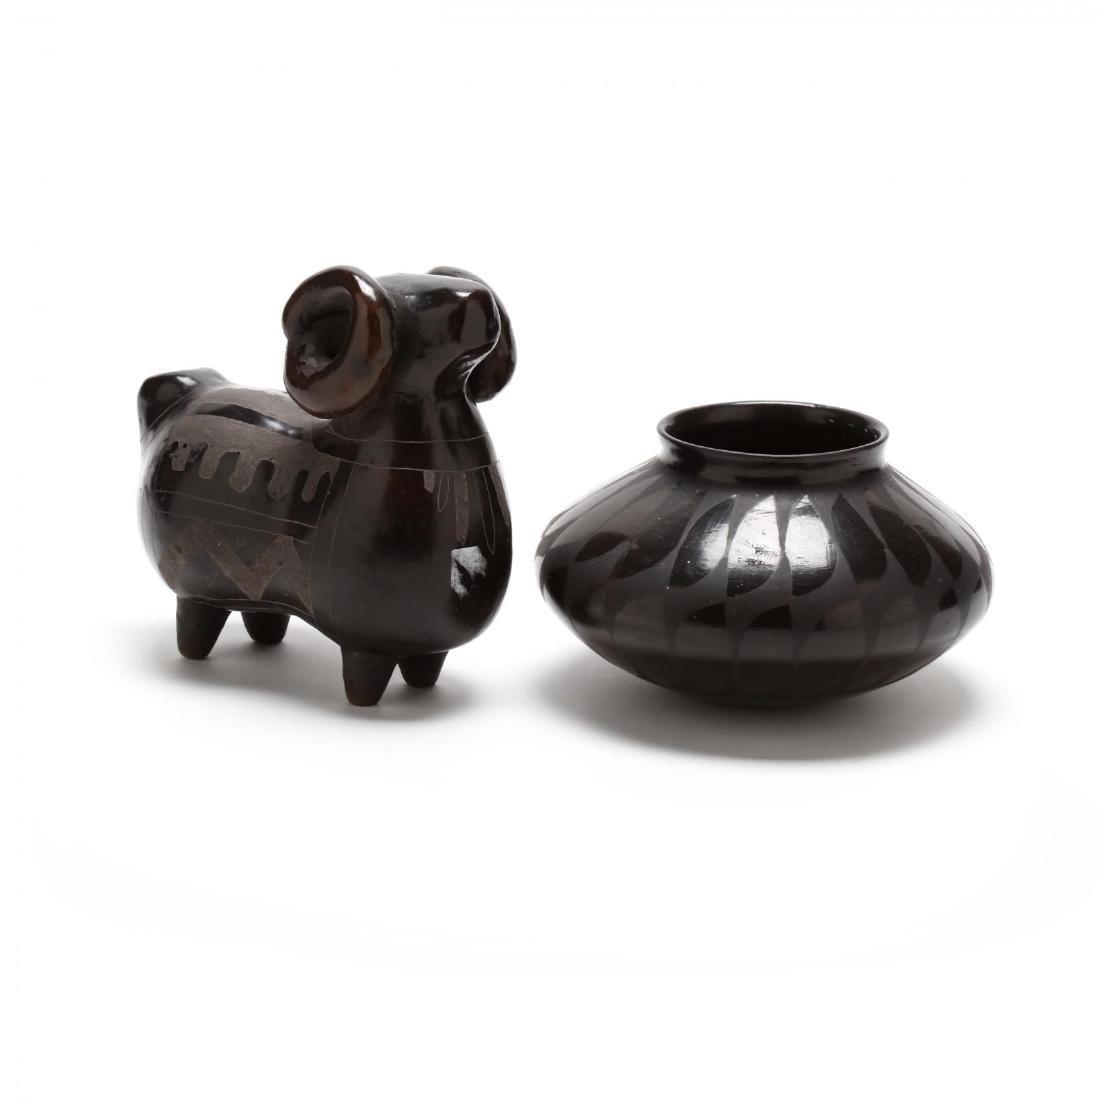 Two Blackware Pottery Vessels